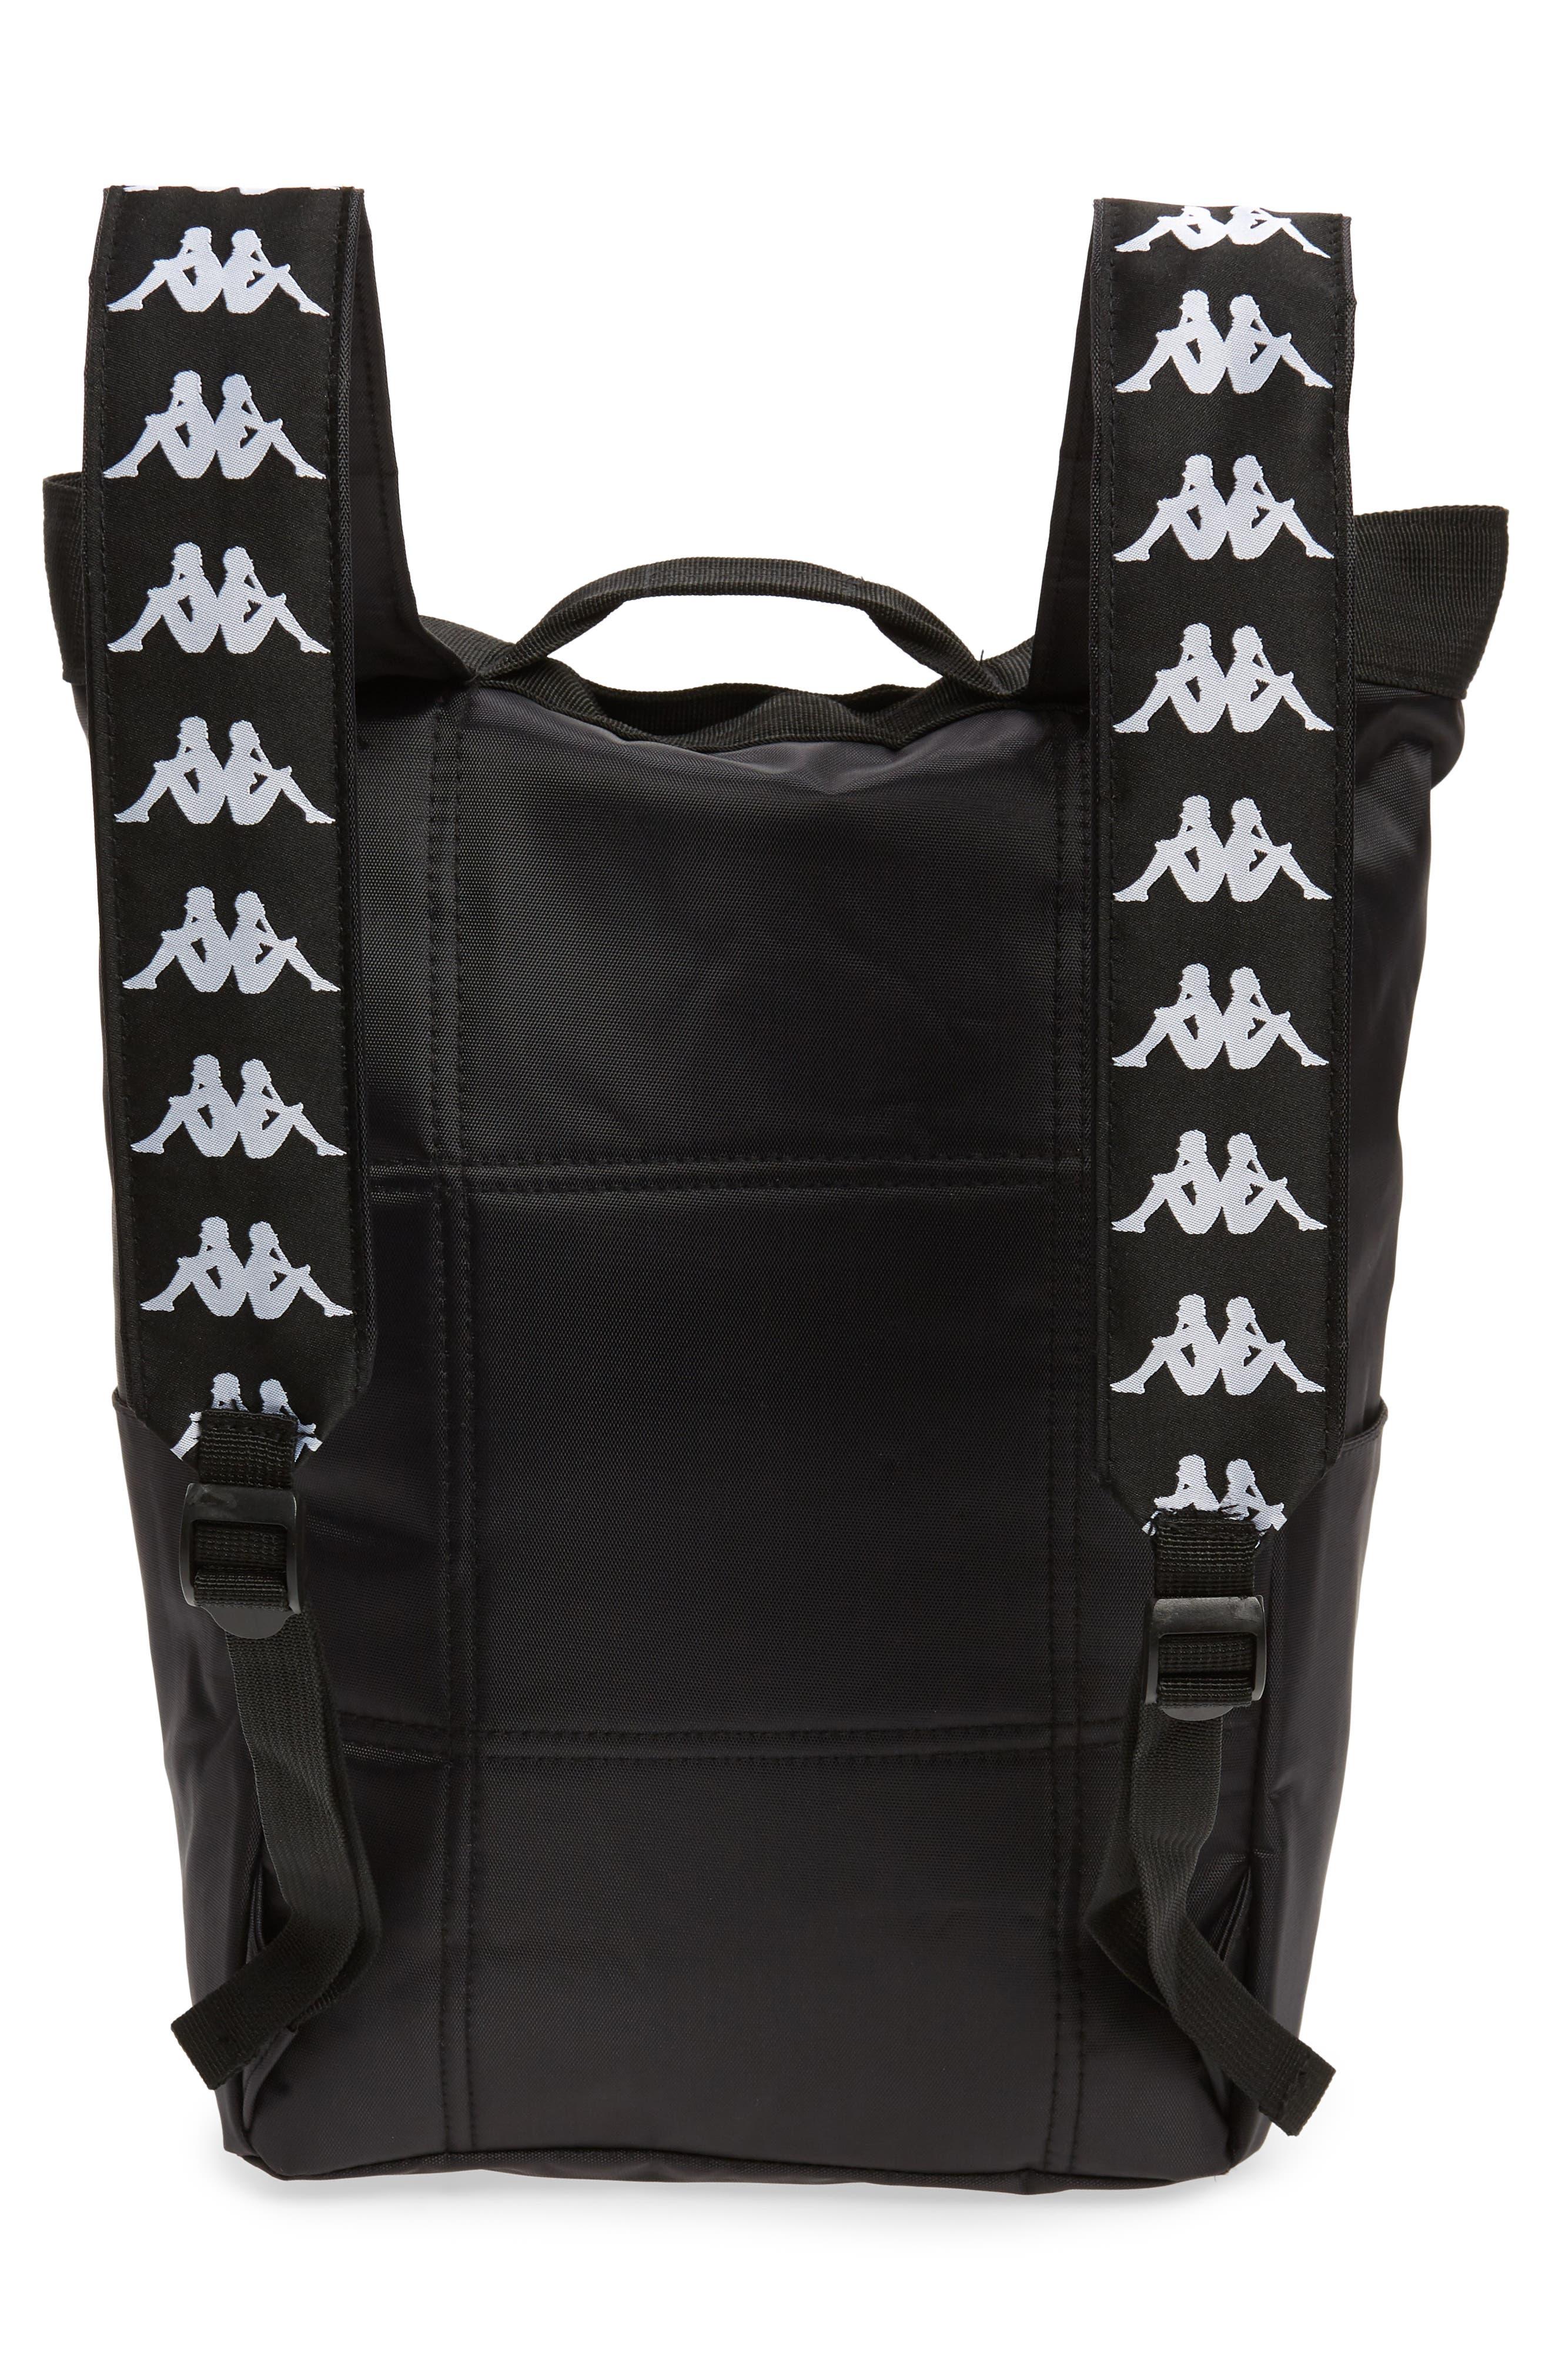 Medium Athletic Backpack,                             Alternate thumbnail 3, color,                             BLACK-WHITE